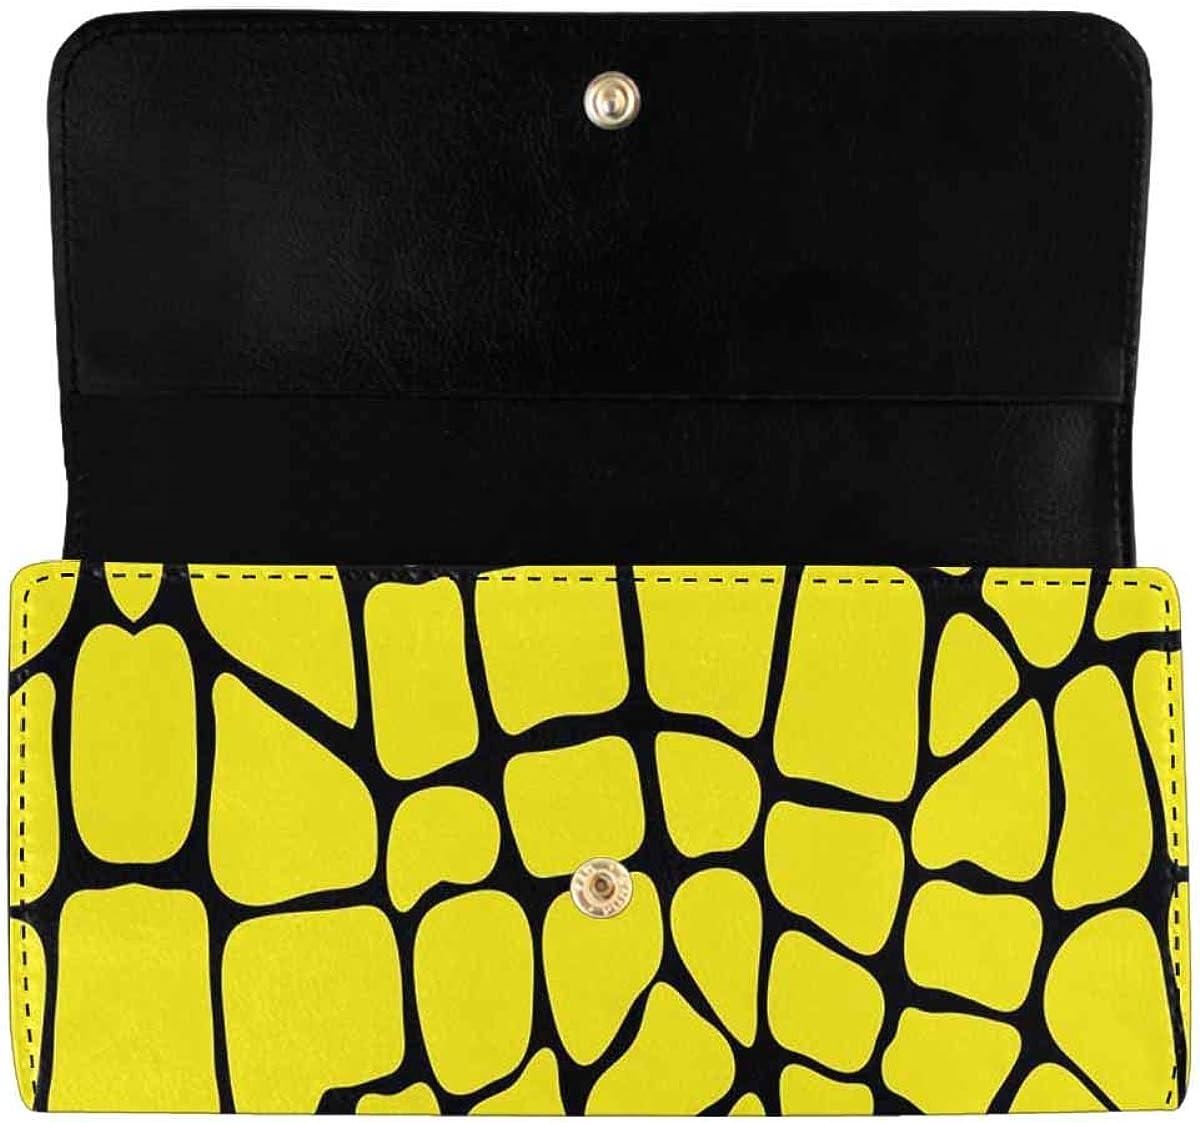 INTERESTPRINT Women's Trifold Clutch Purses Abstract Tiger Pattern Card Holder Wallet